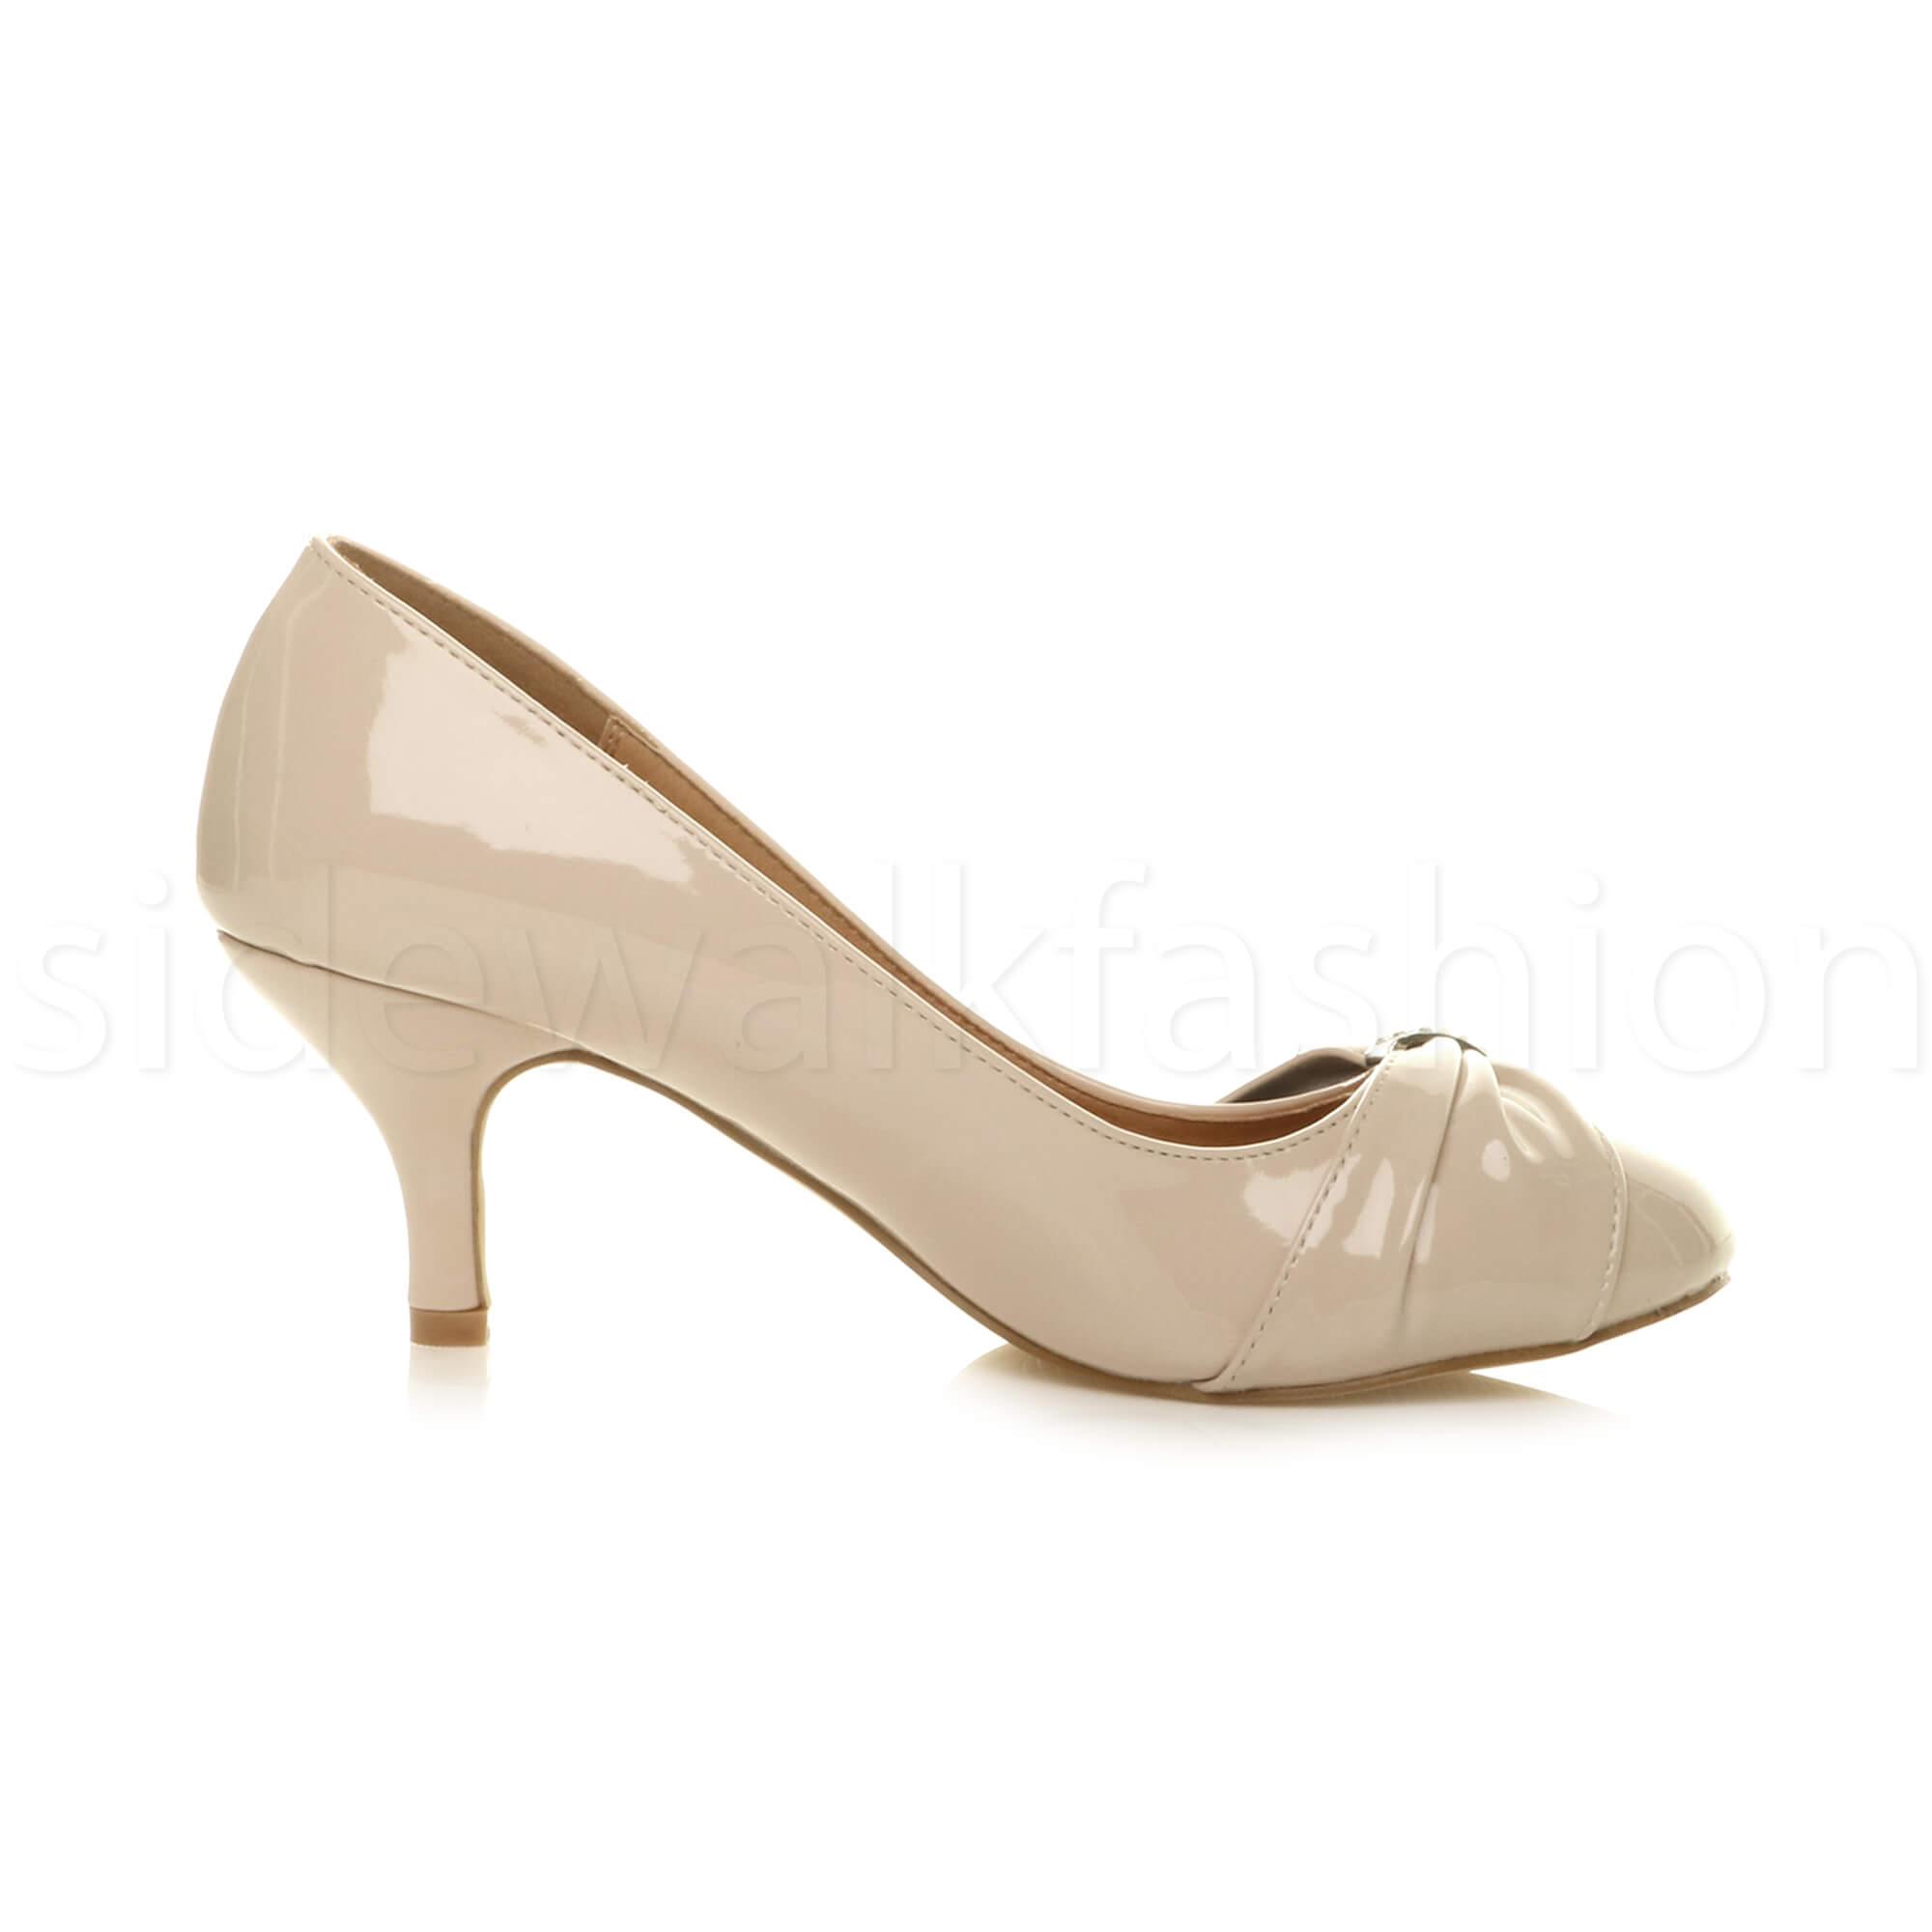 Womens-ladies-low-mid-heel-diamante-party-smart-evening-court-shoes-size thumbnail 68